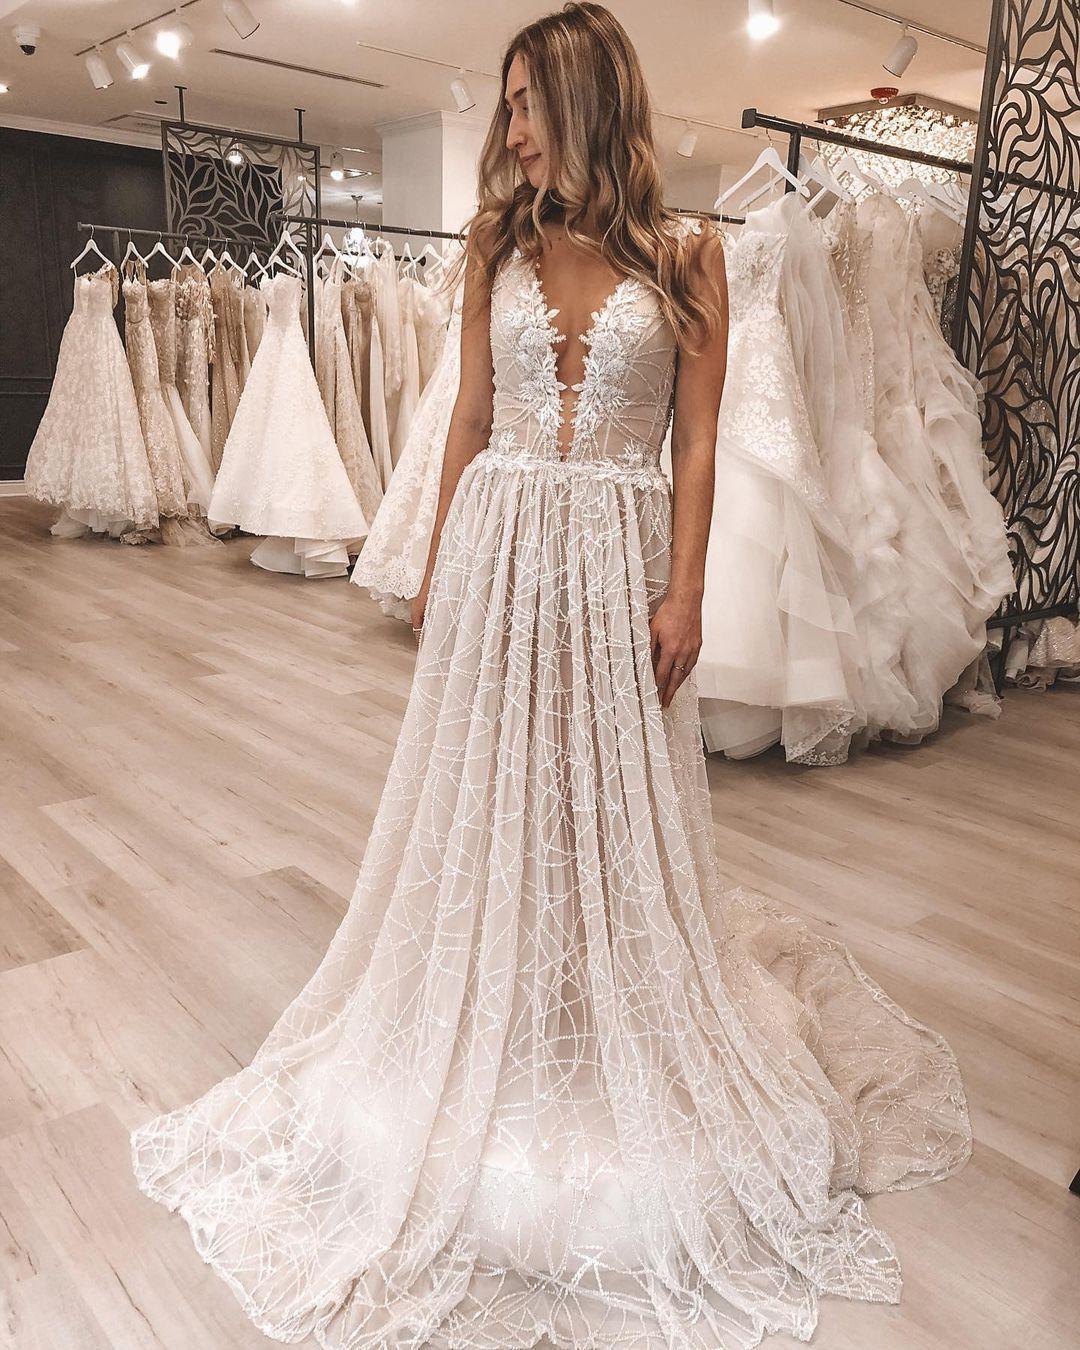 Galia Lahav Plunge Neckline Sparkle Wedding Gown In 2021 Online Wedding Dress Sparkle Wedding Dress Indian Wedding Dress Designers [ 1350 x 1080 Pixel ]